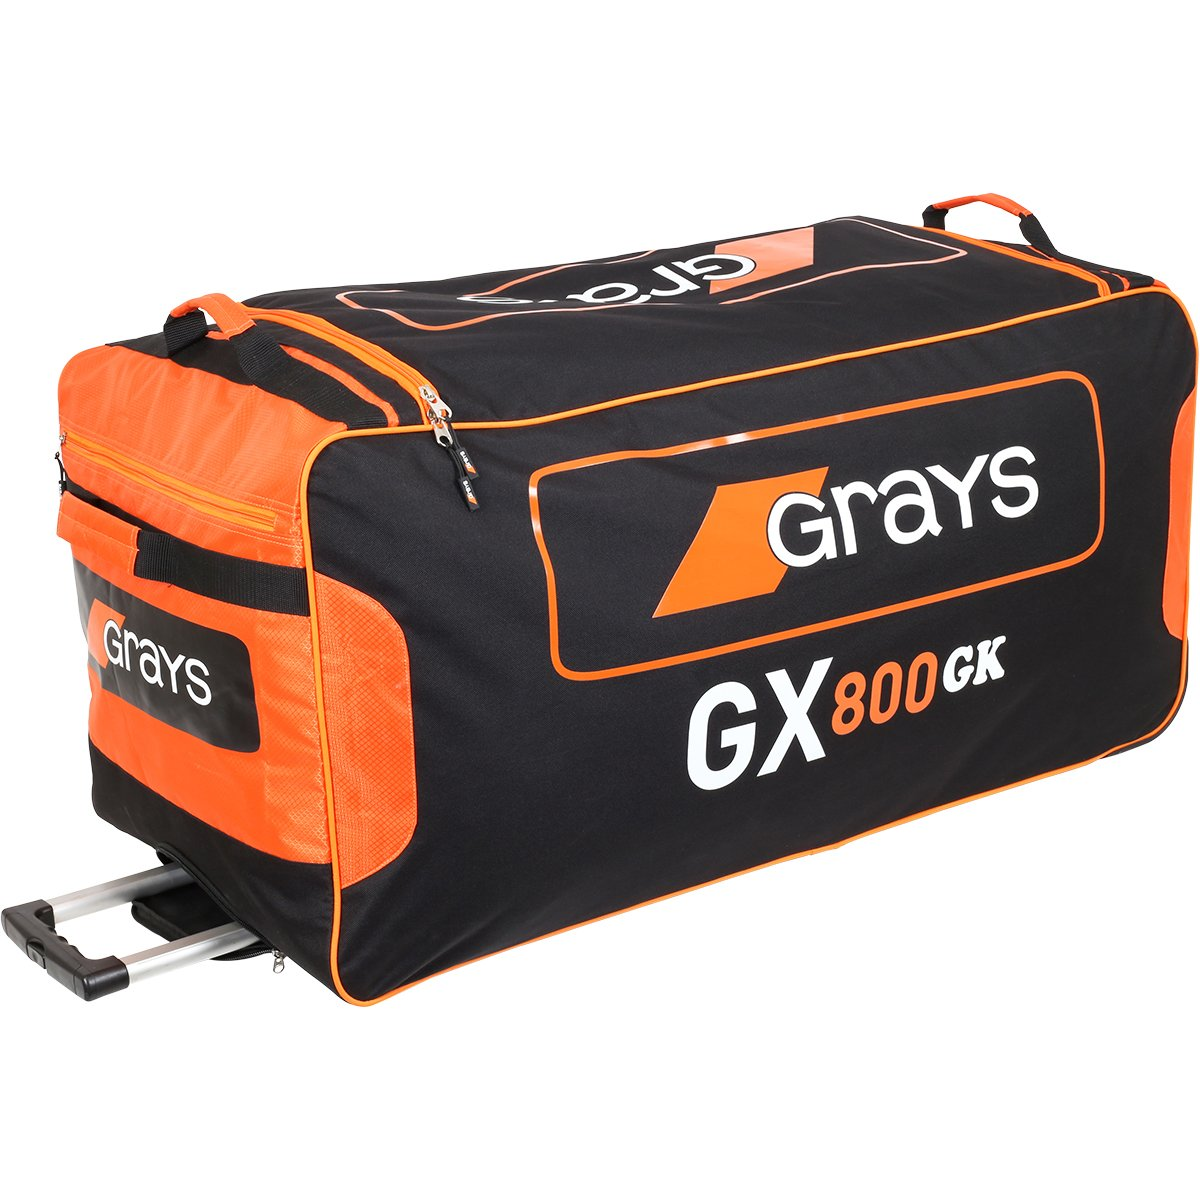 GRAYS GX800 GOALIE HOCKEY BAG - ORANGE/BLACK